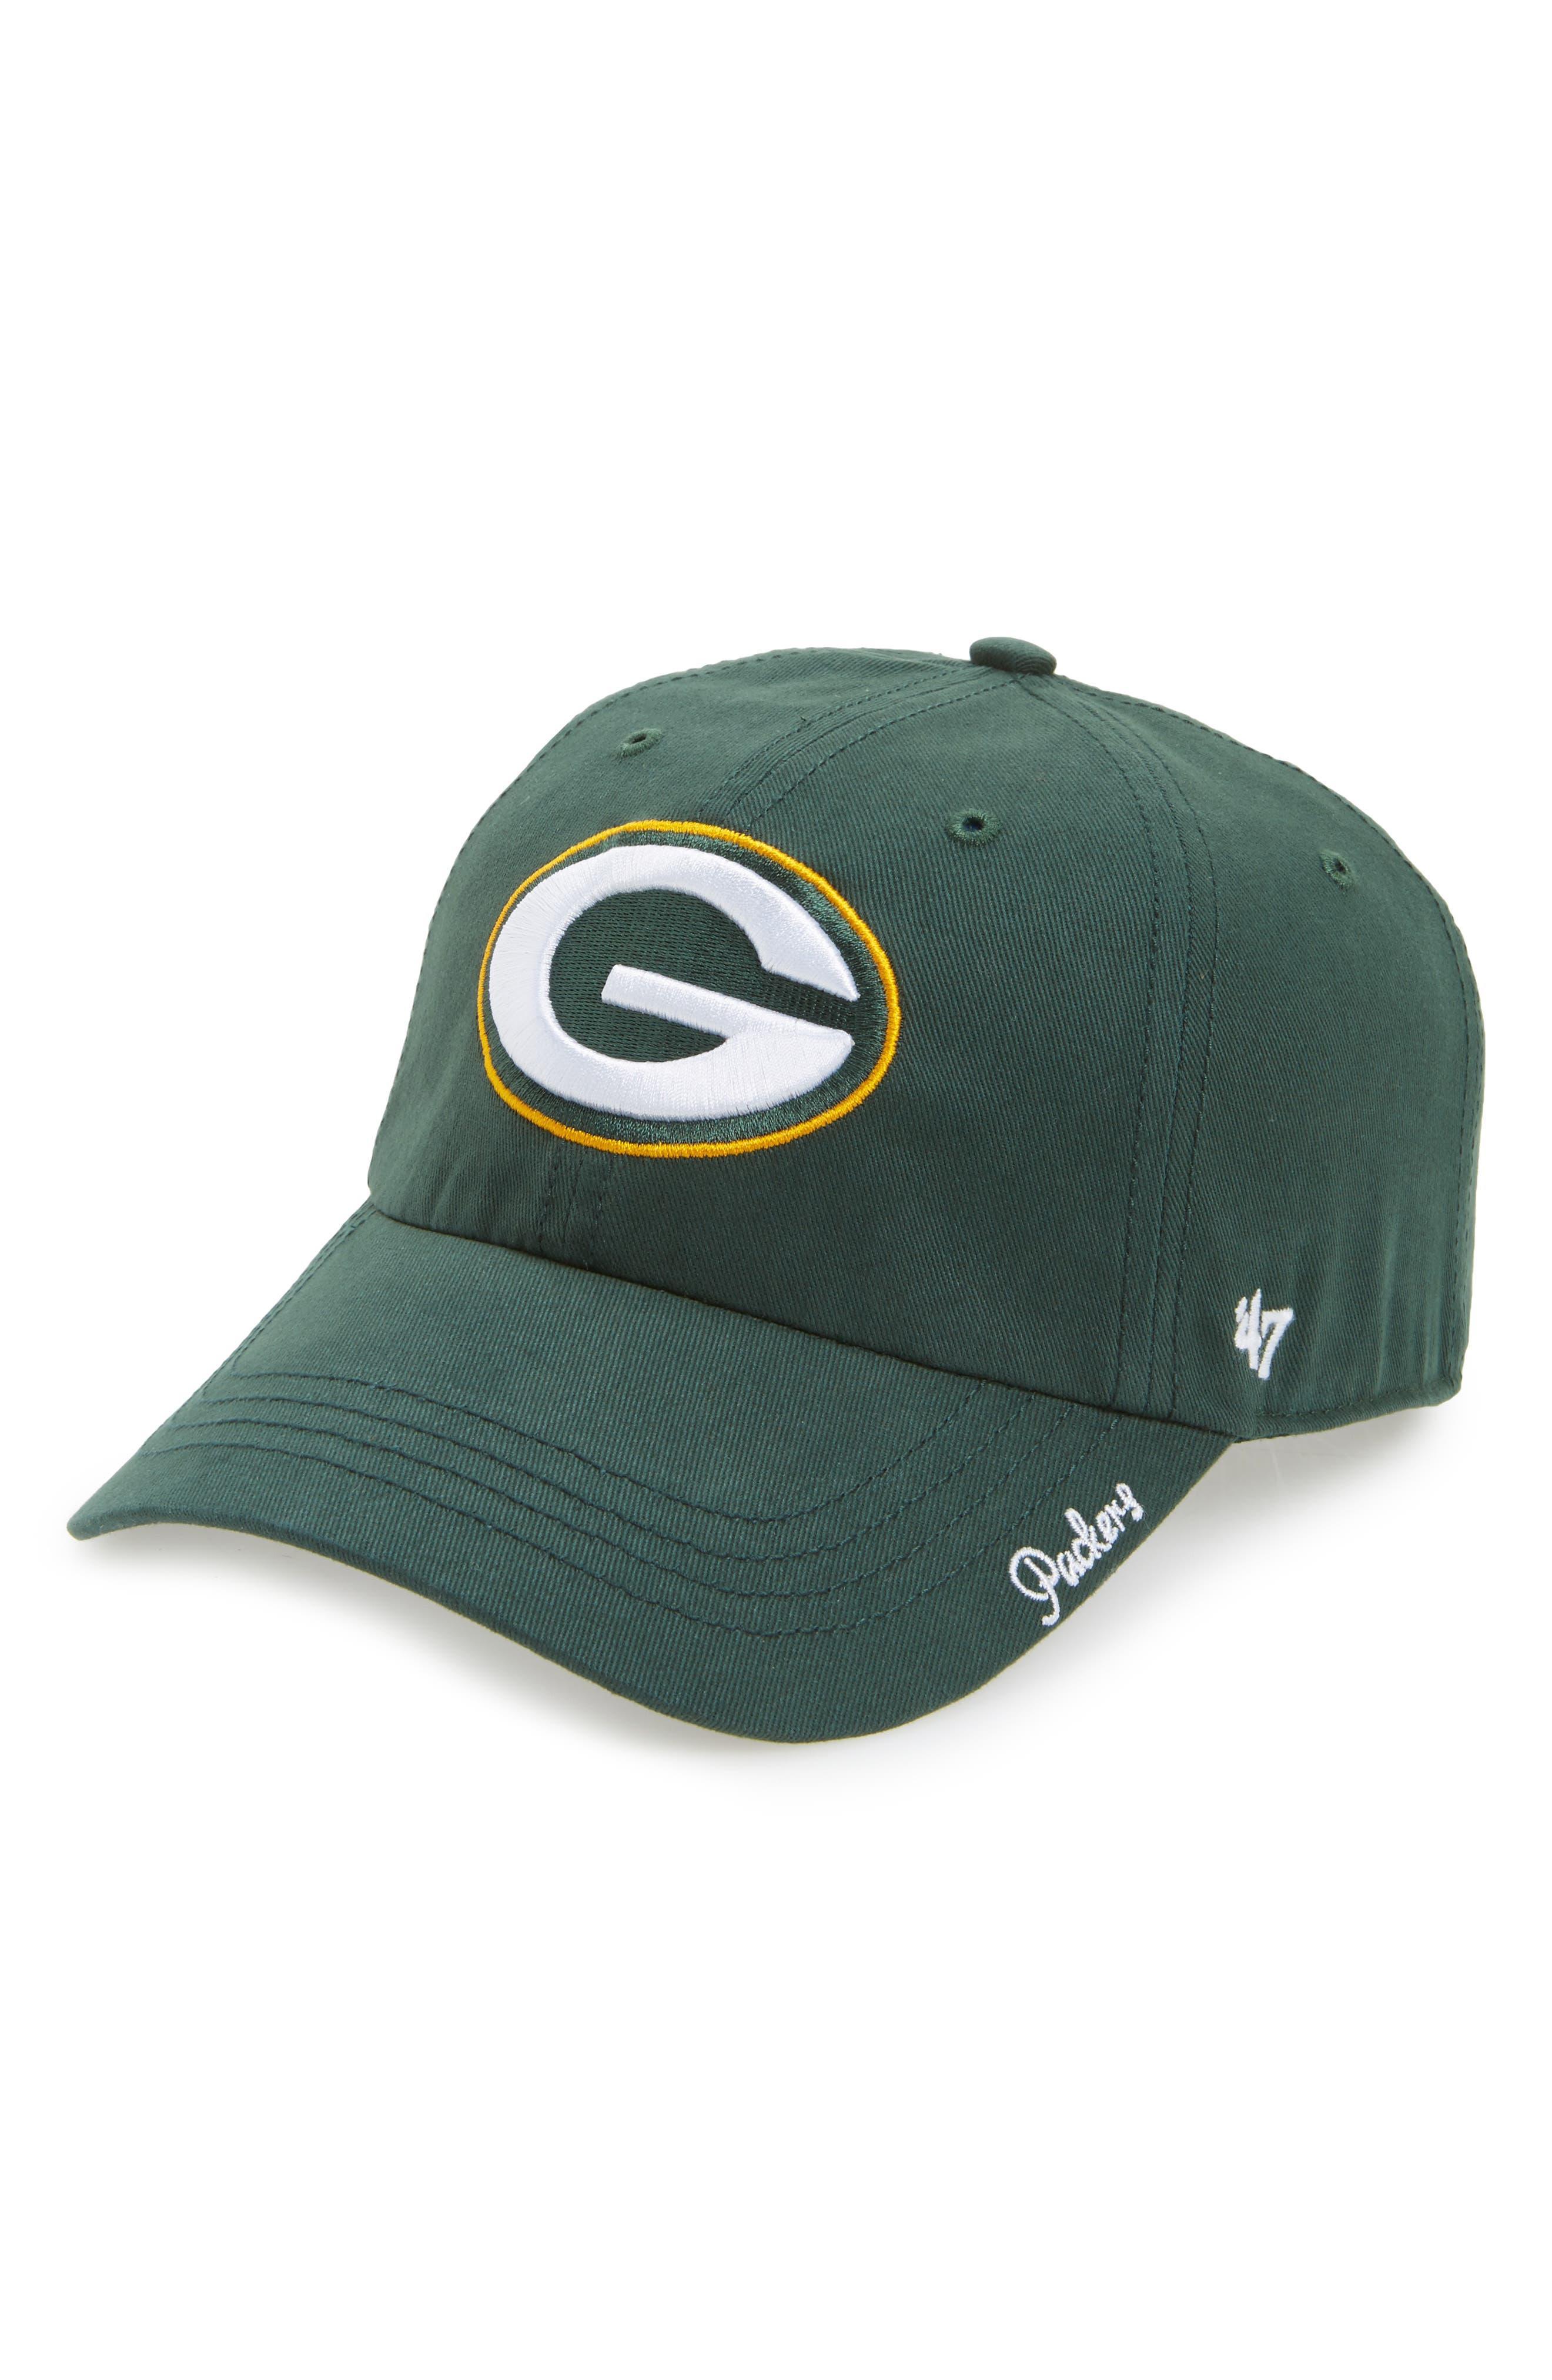 '47 Green Bay Packers Cap